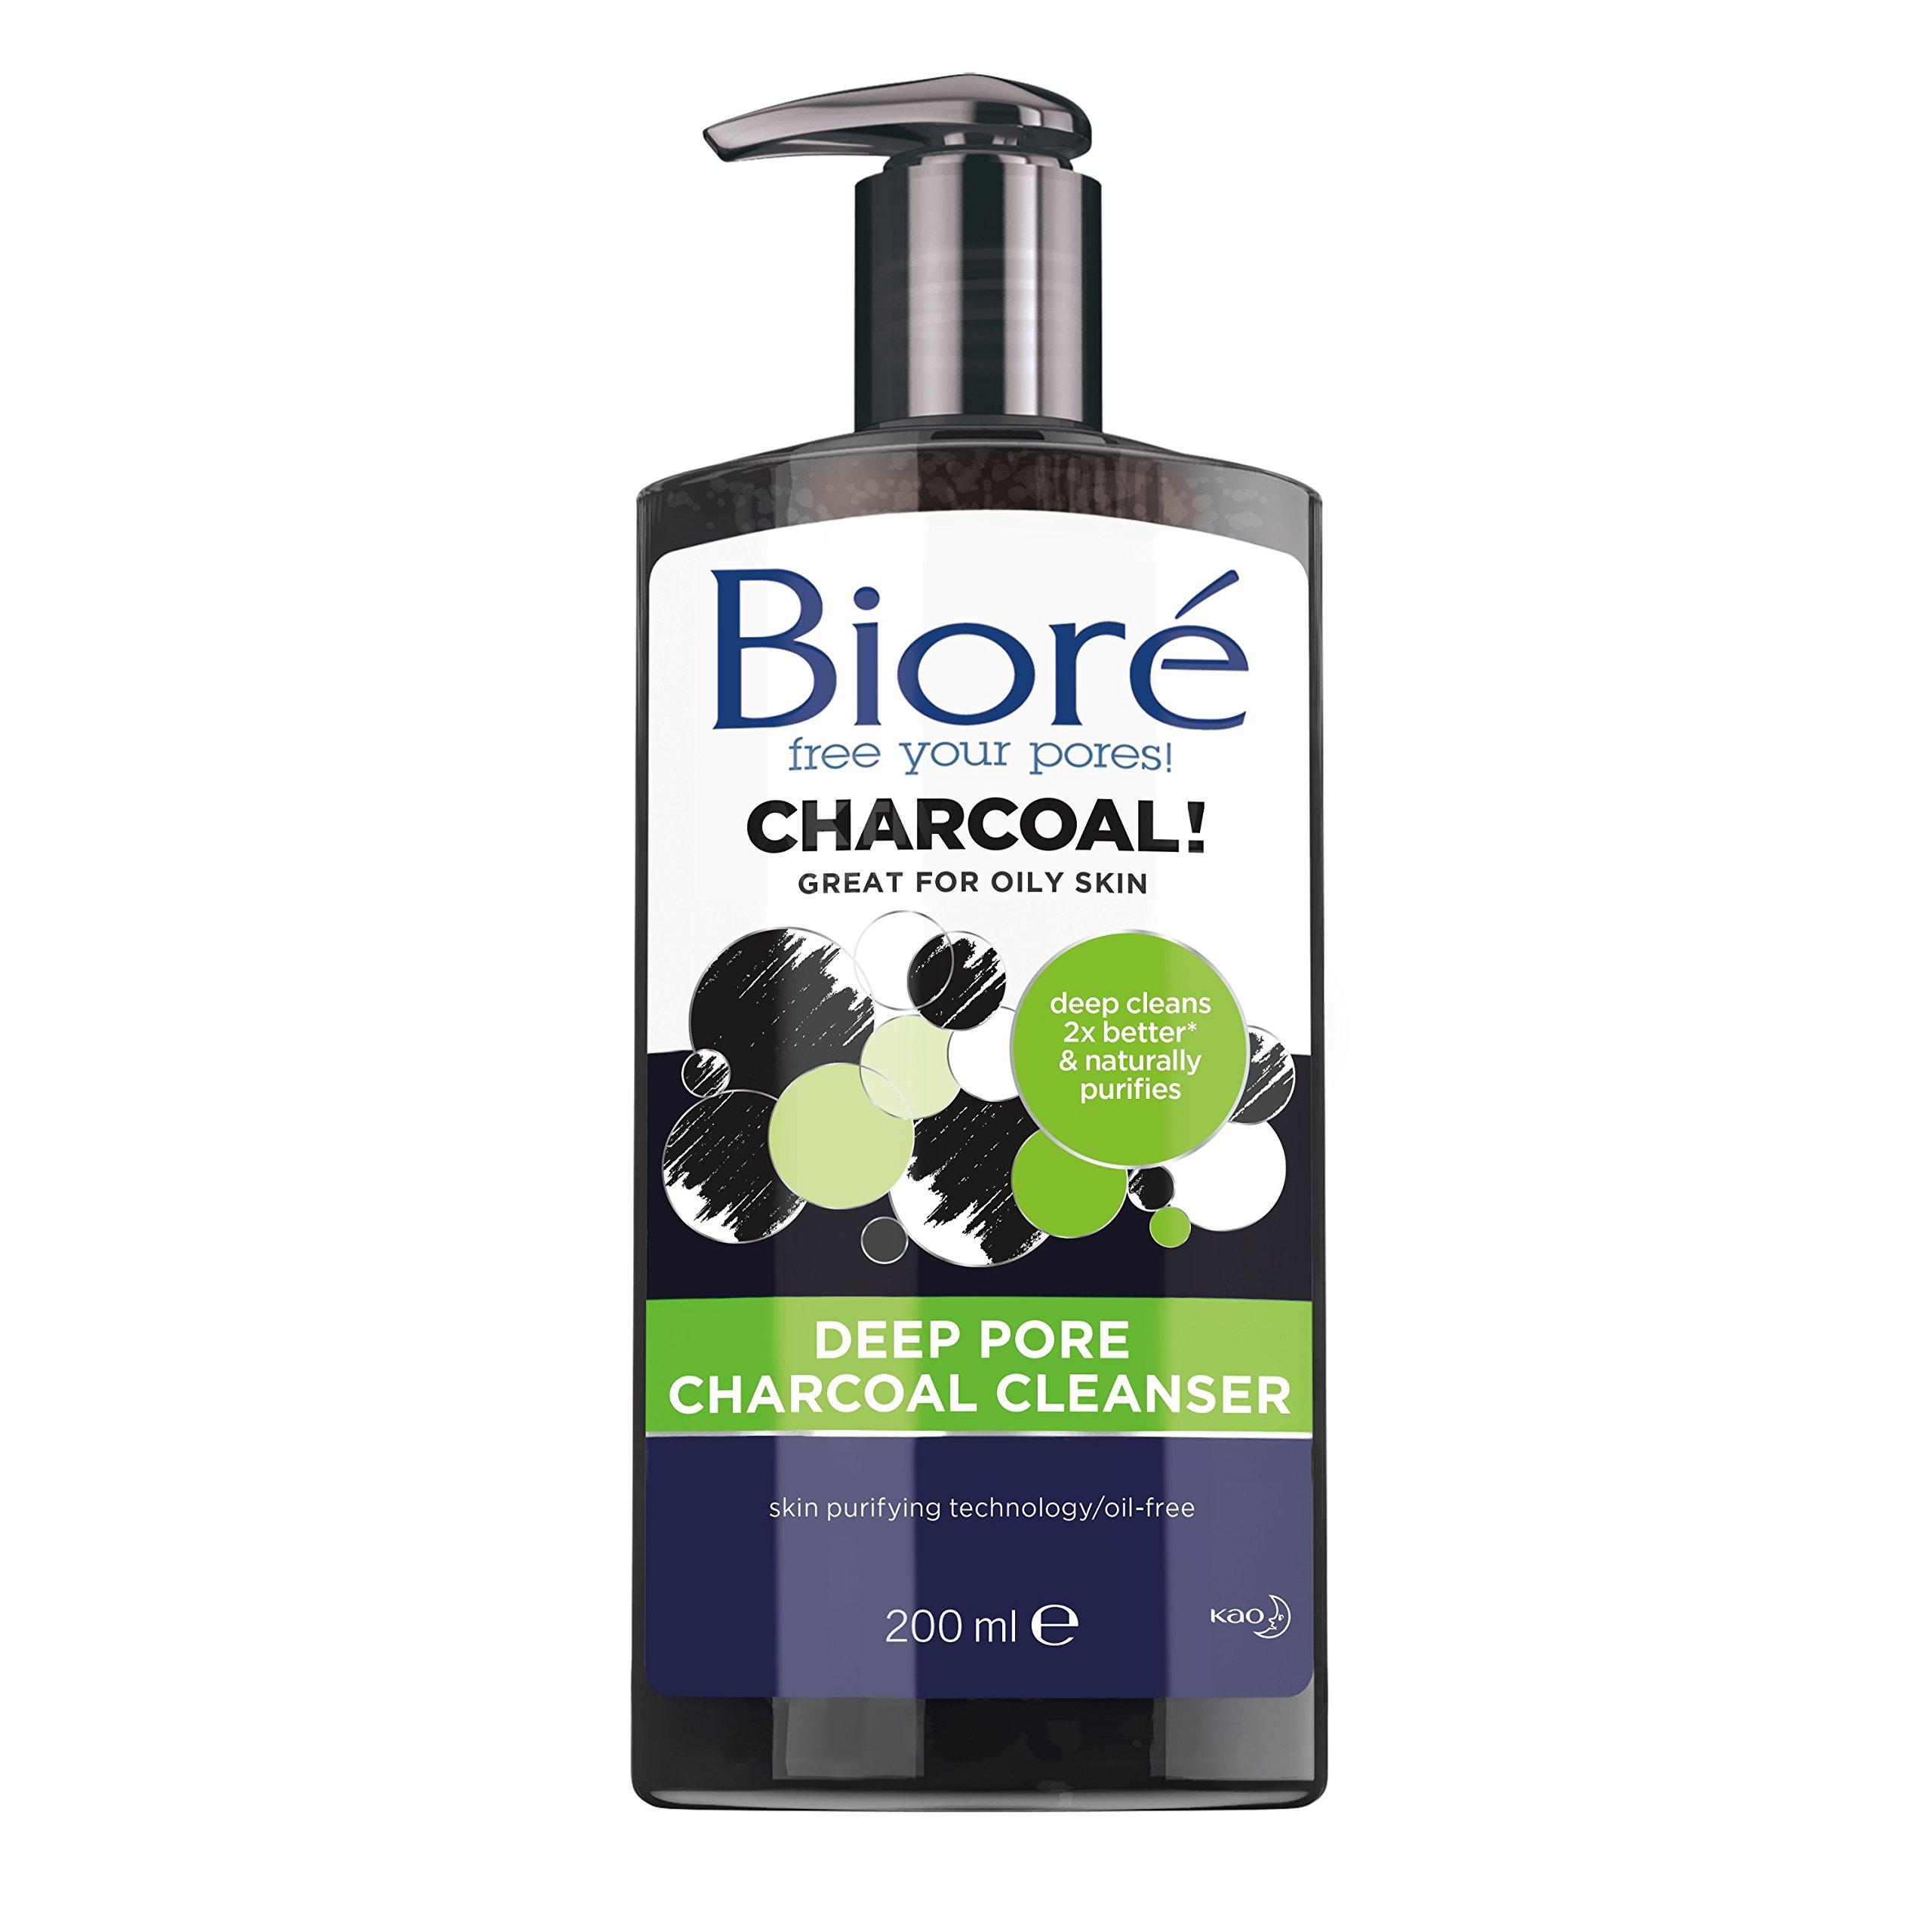 Bioré Deep Pore Charcoal Cleanser for Oily Skin, 6.77oz